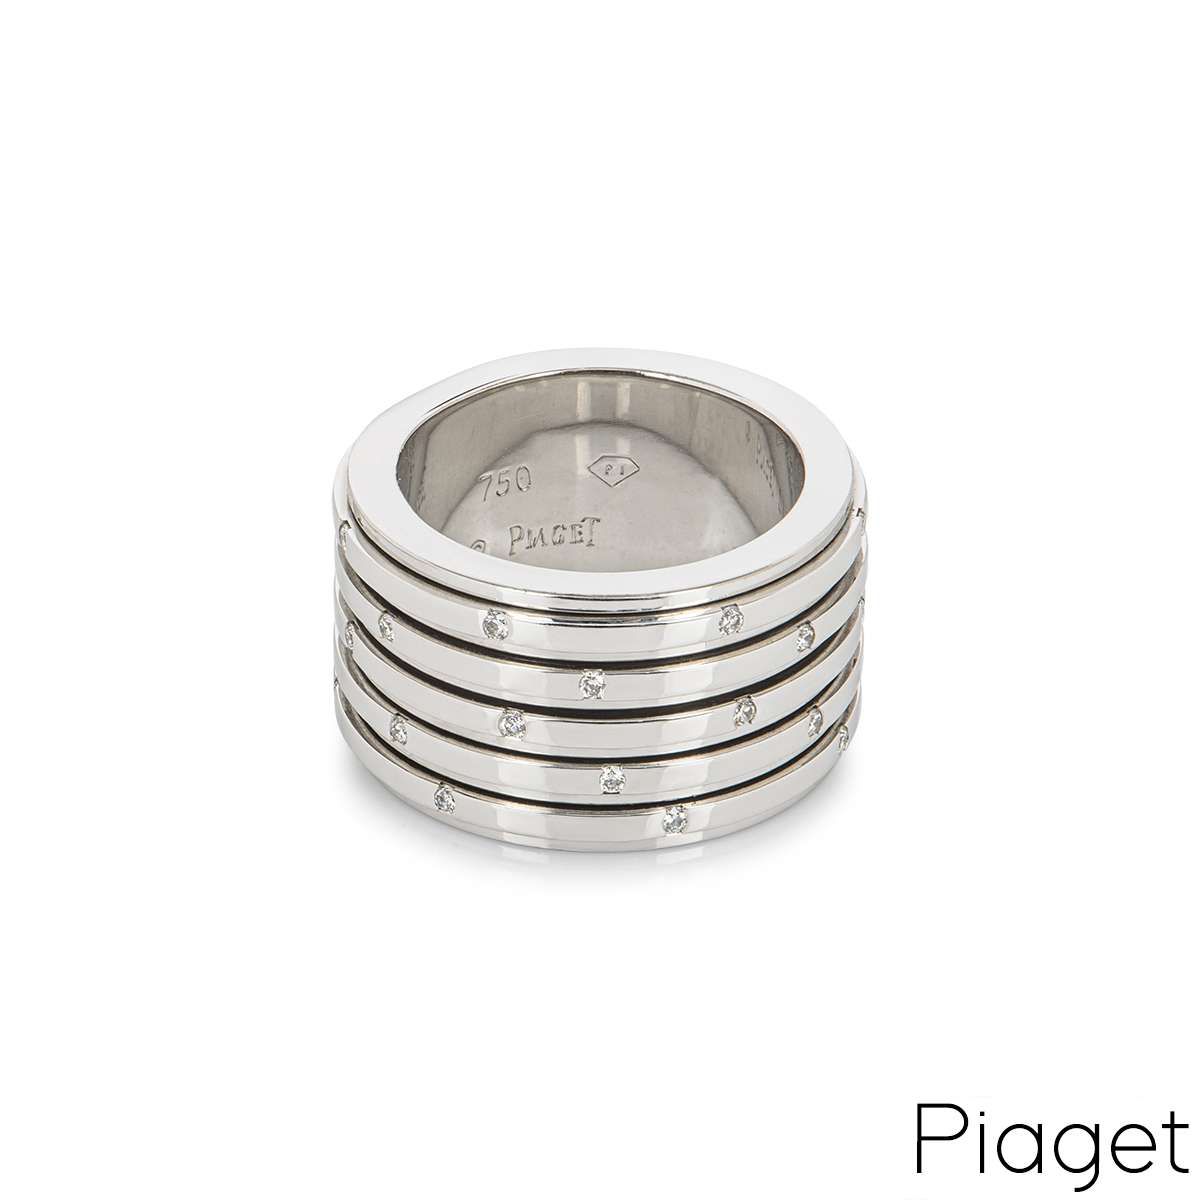 Piaget White Gold Diamond Possession Ring Size 52